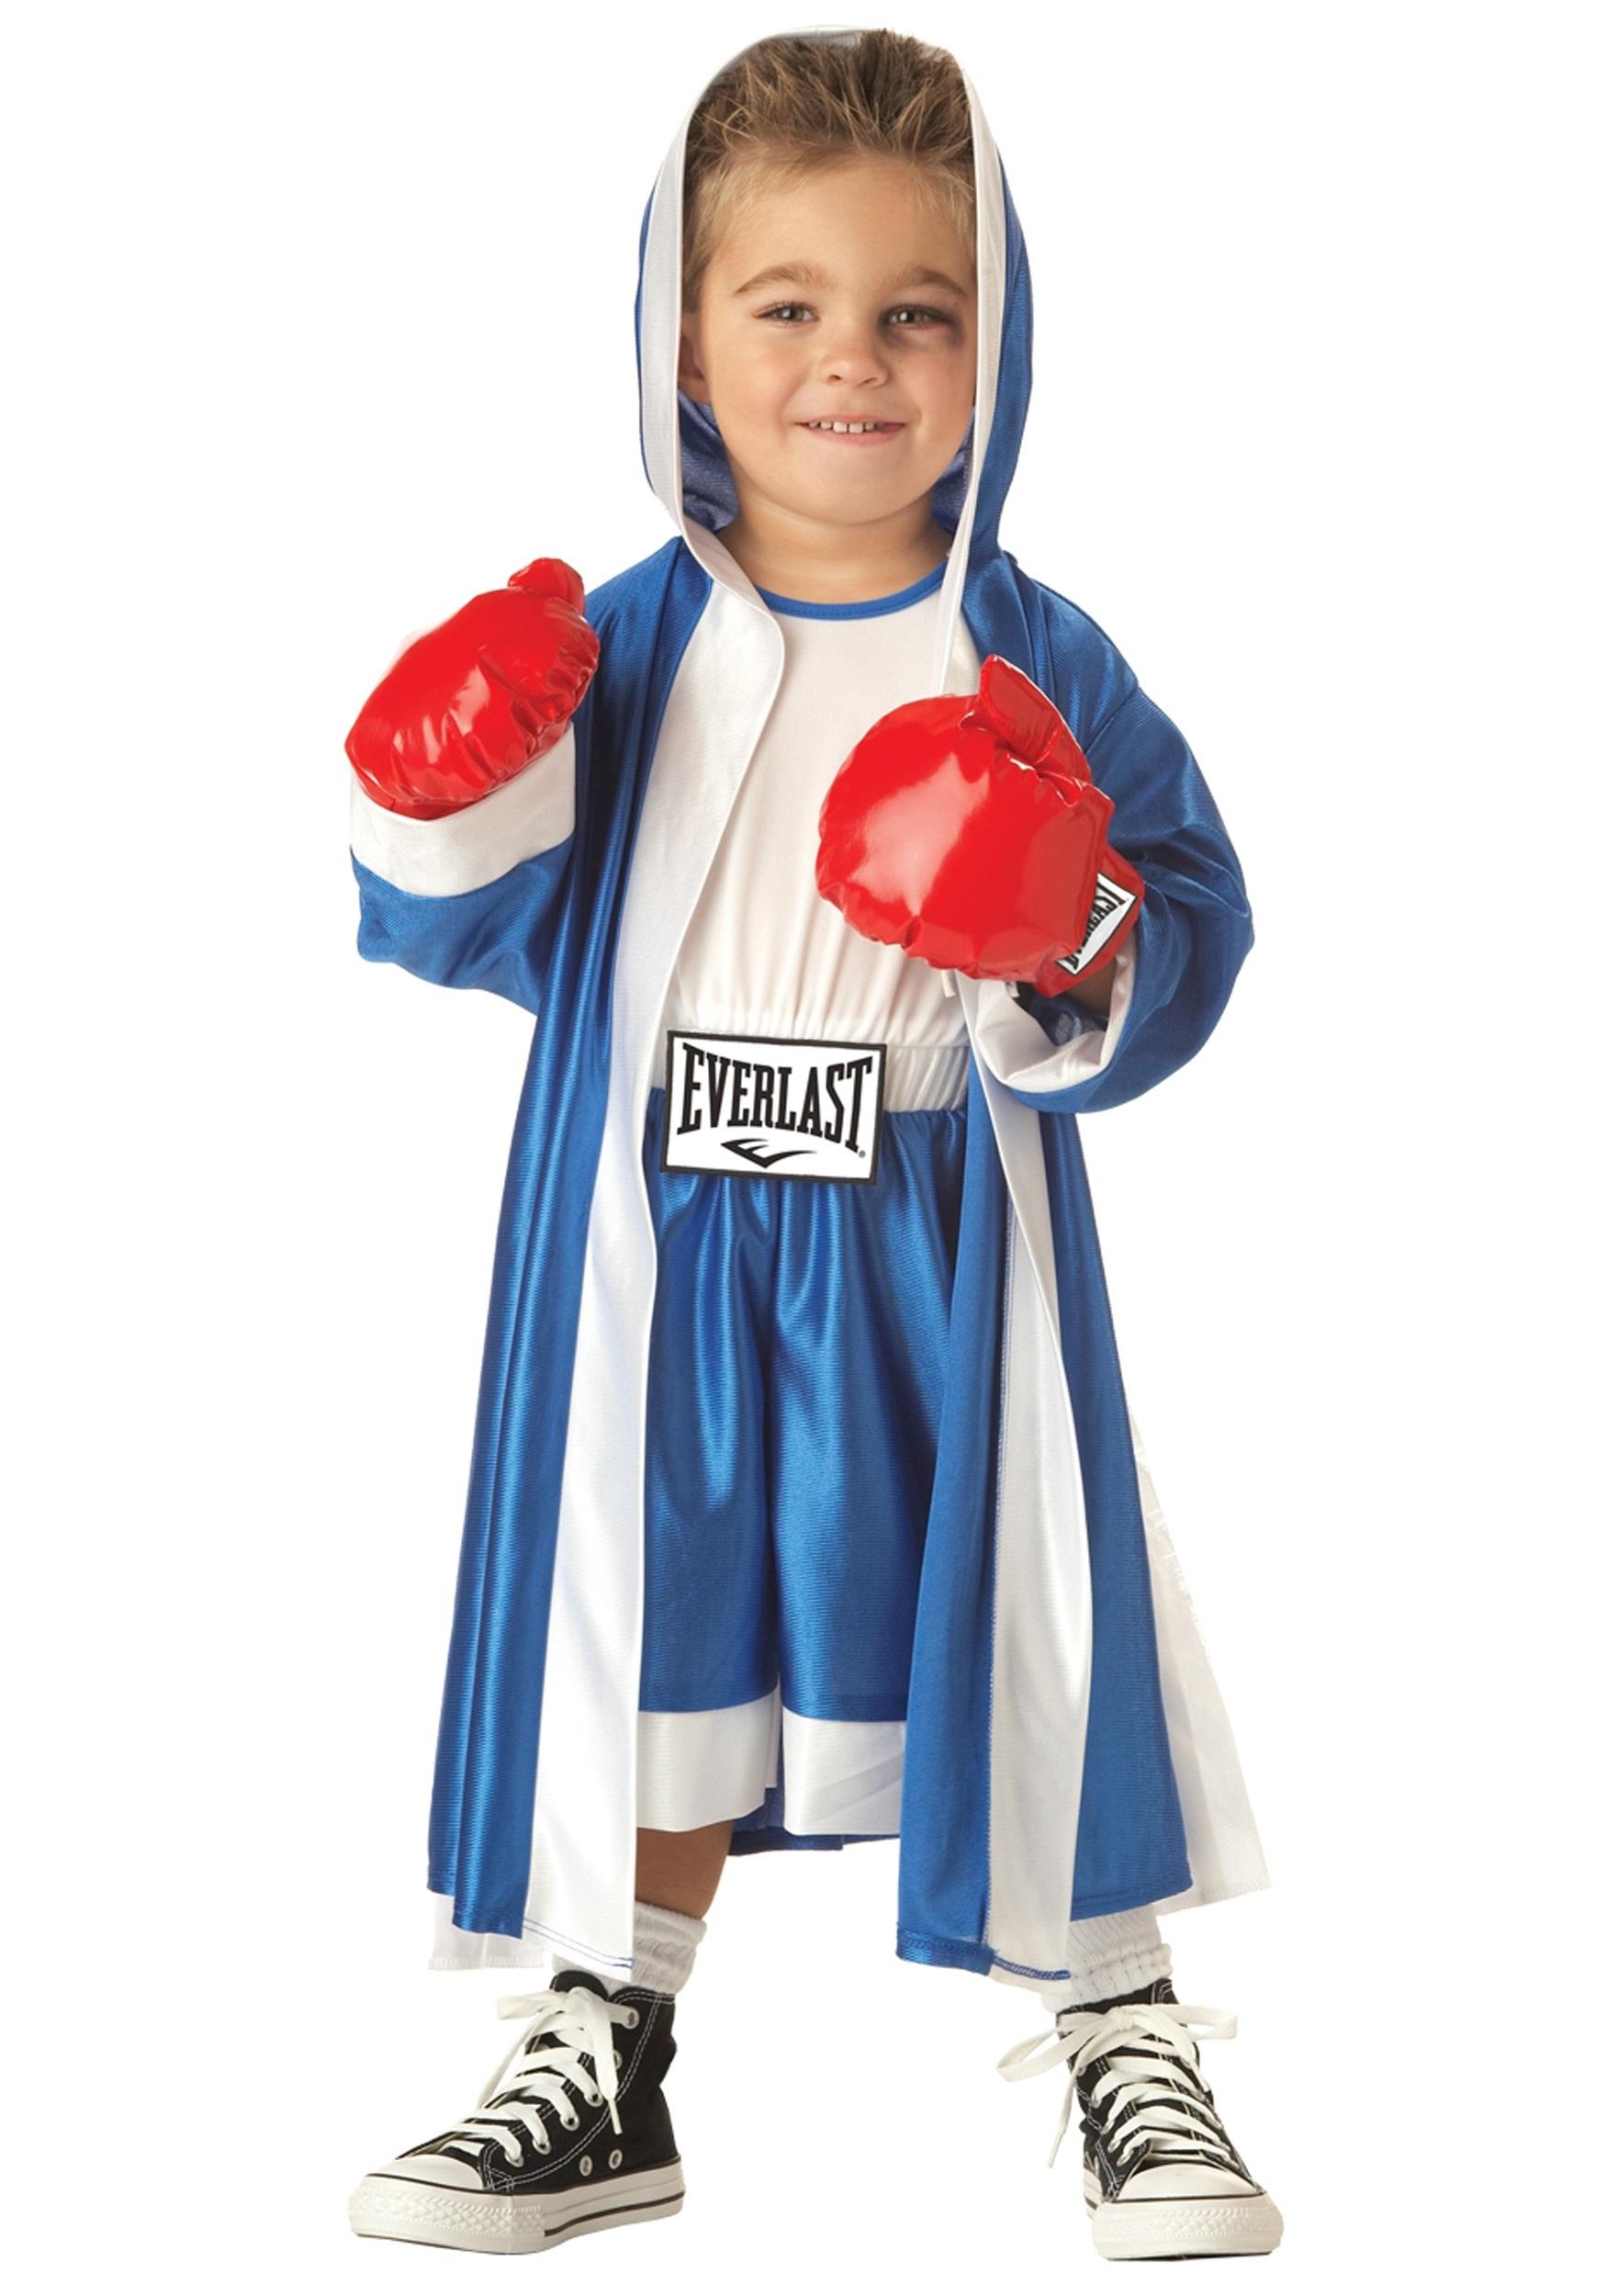 Toddler Everlast Boxer Costume  sc 1 st  Halloween Costumes & Toddler Everlast Boxer Costume - Halloween Costumes